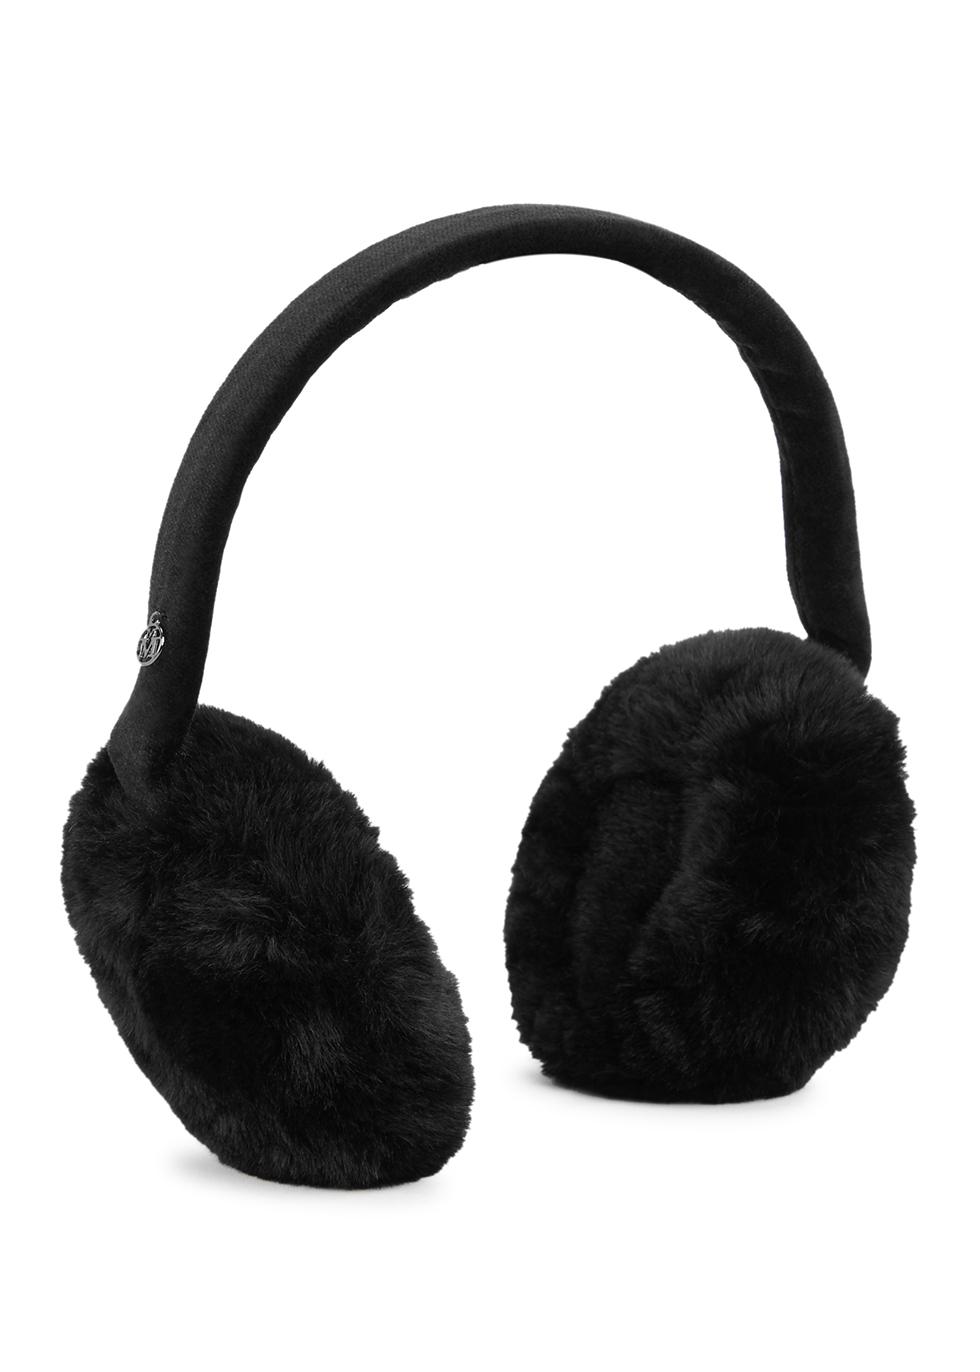 Morgana black faux fur ear muffs